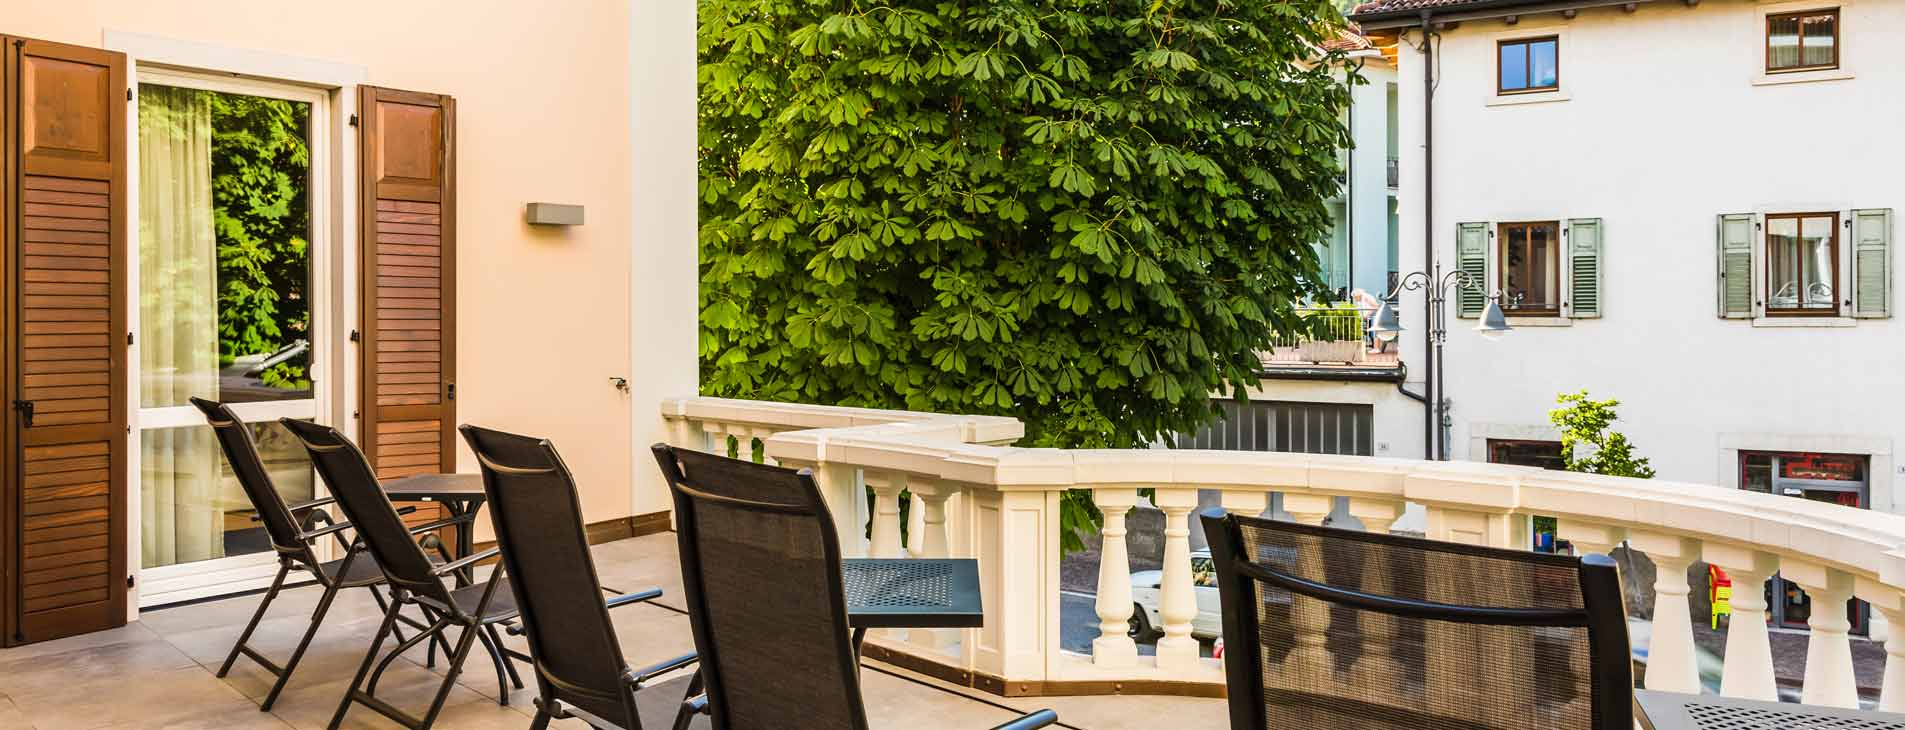 Hotel Caffè Centrale, Mezzocorona, Trento